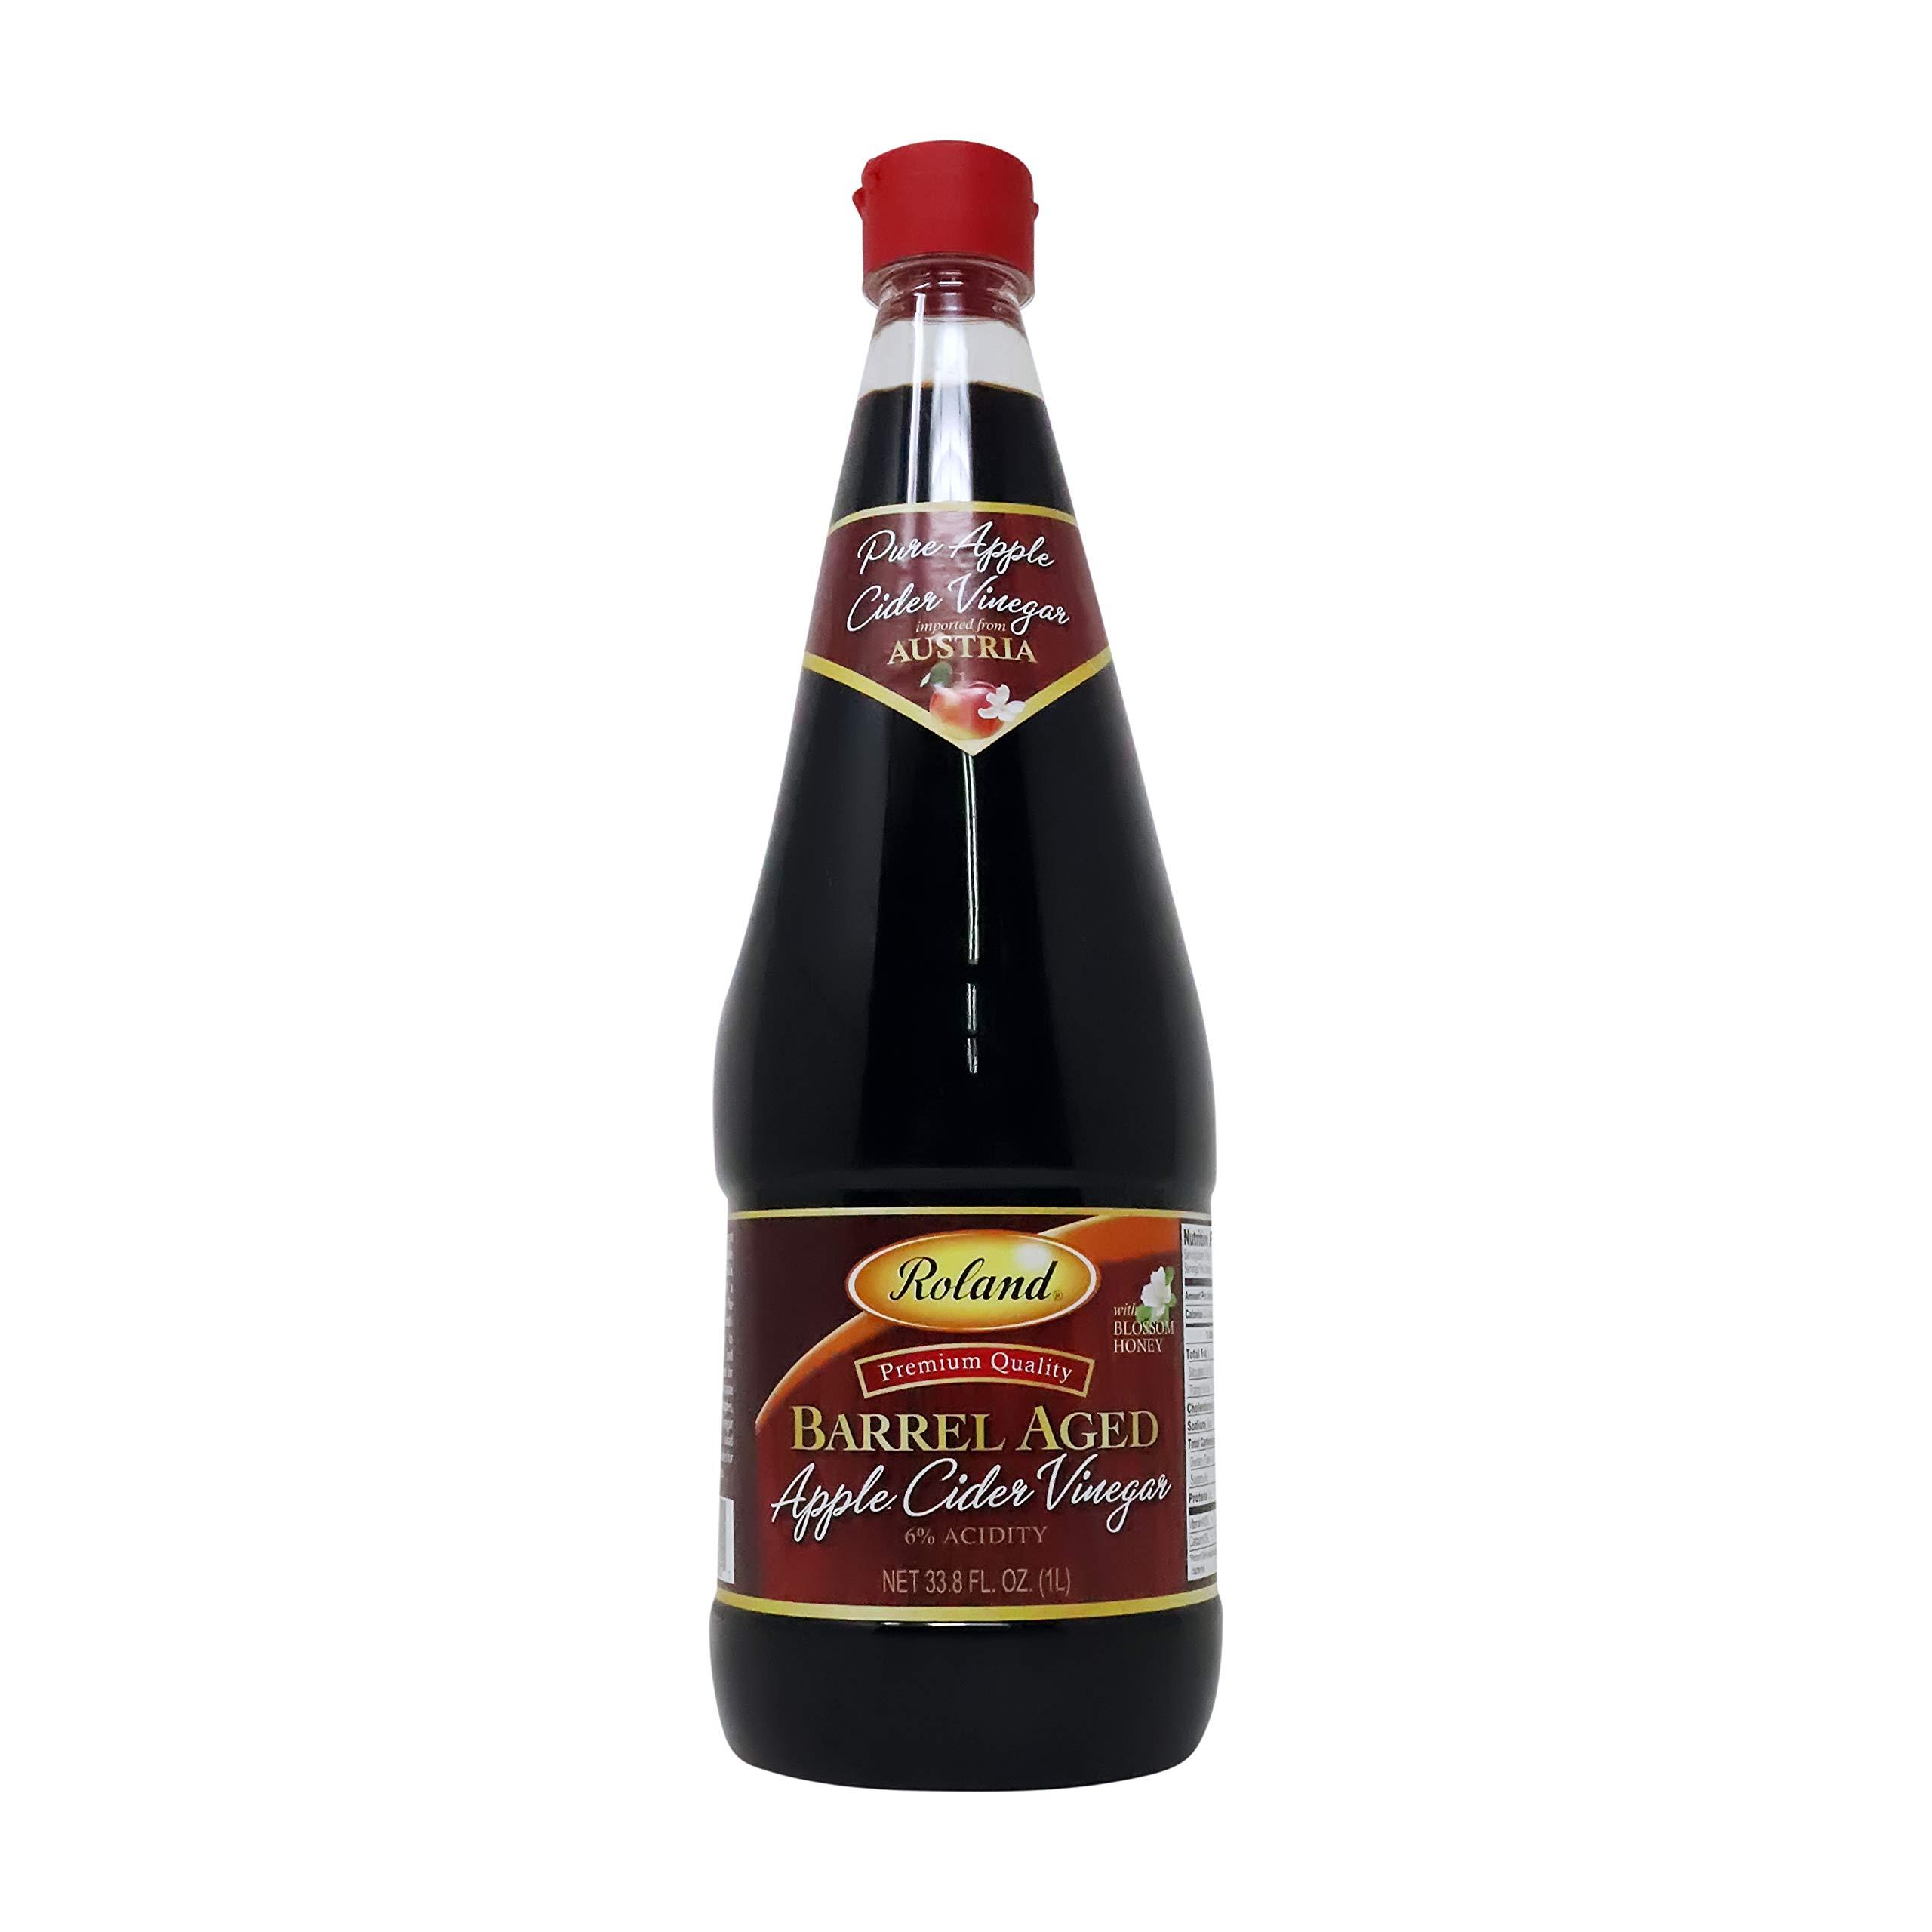 Roland- Premium Quality Barrel Aged Pure Apple Cider Vinegar by RD